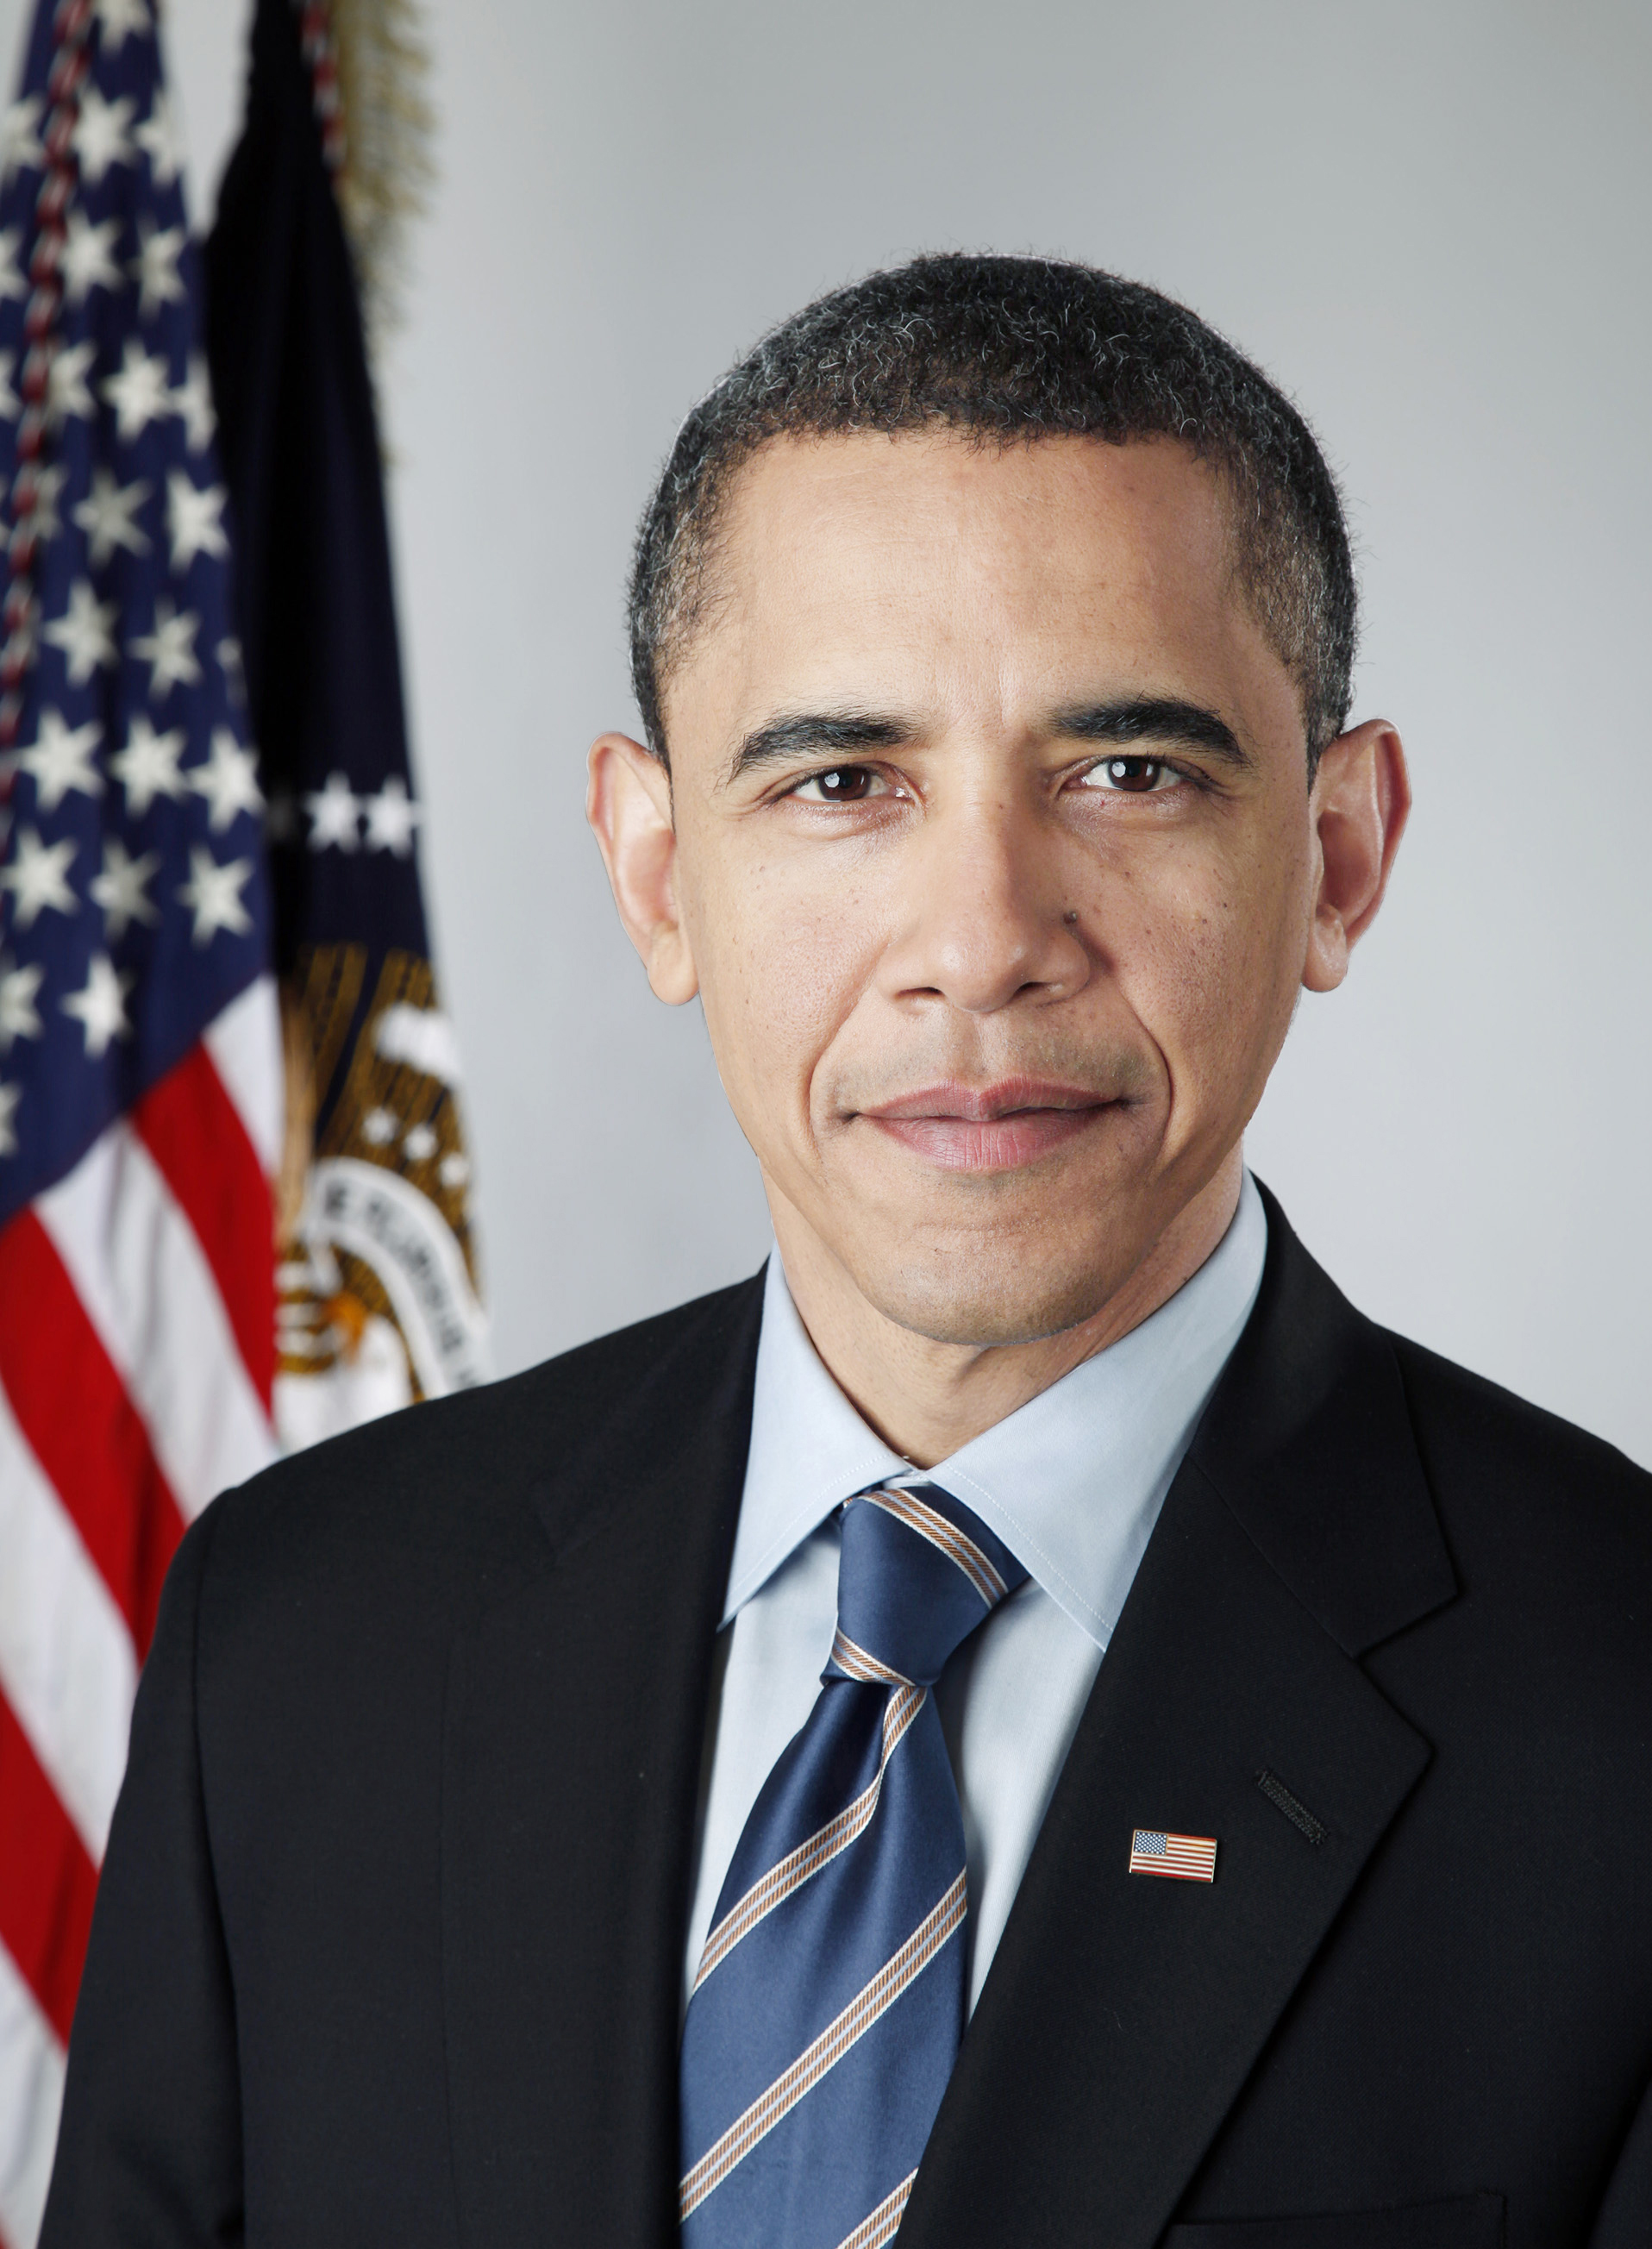 Obama 290 - Copy - Copy.jpg